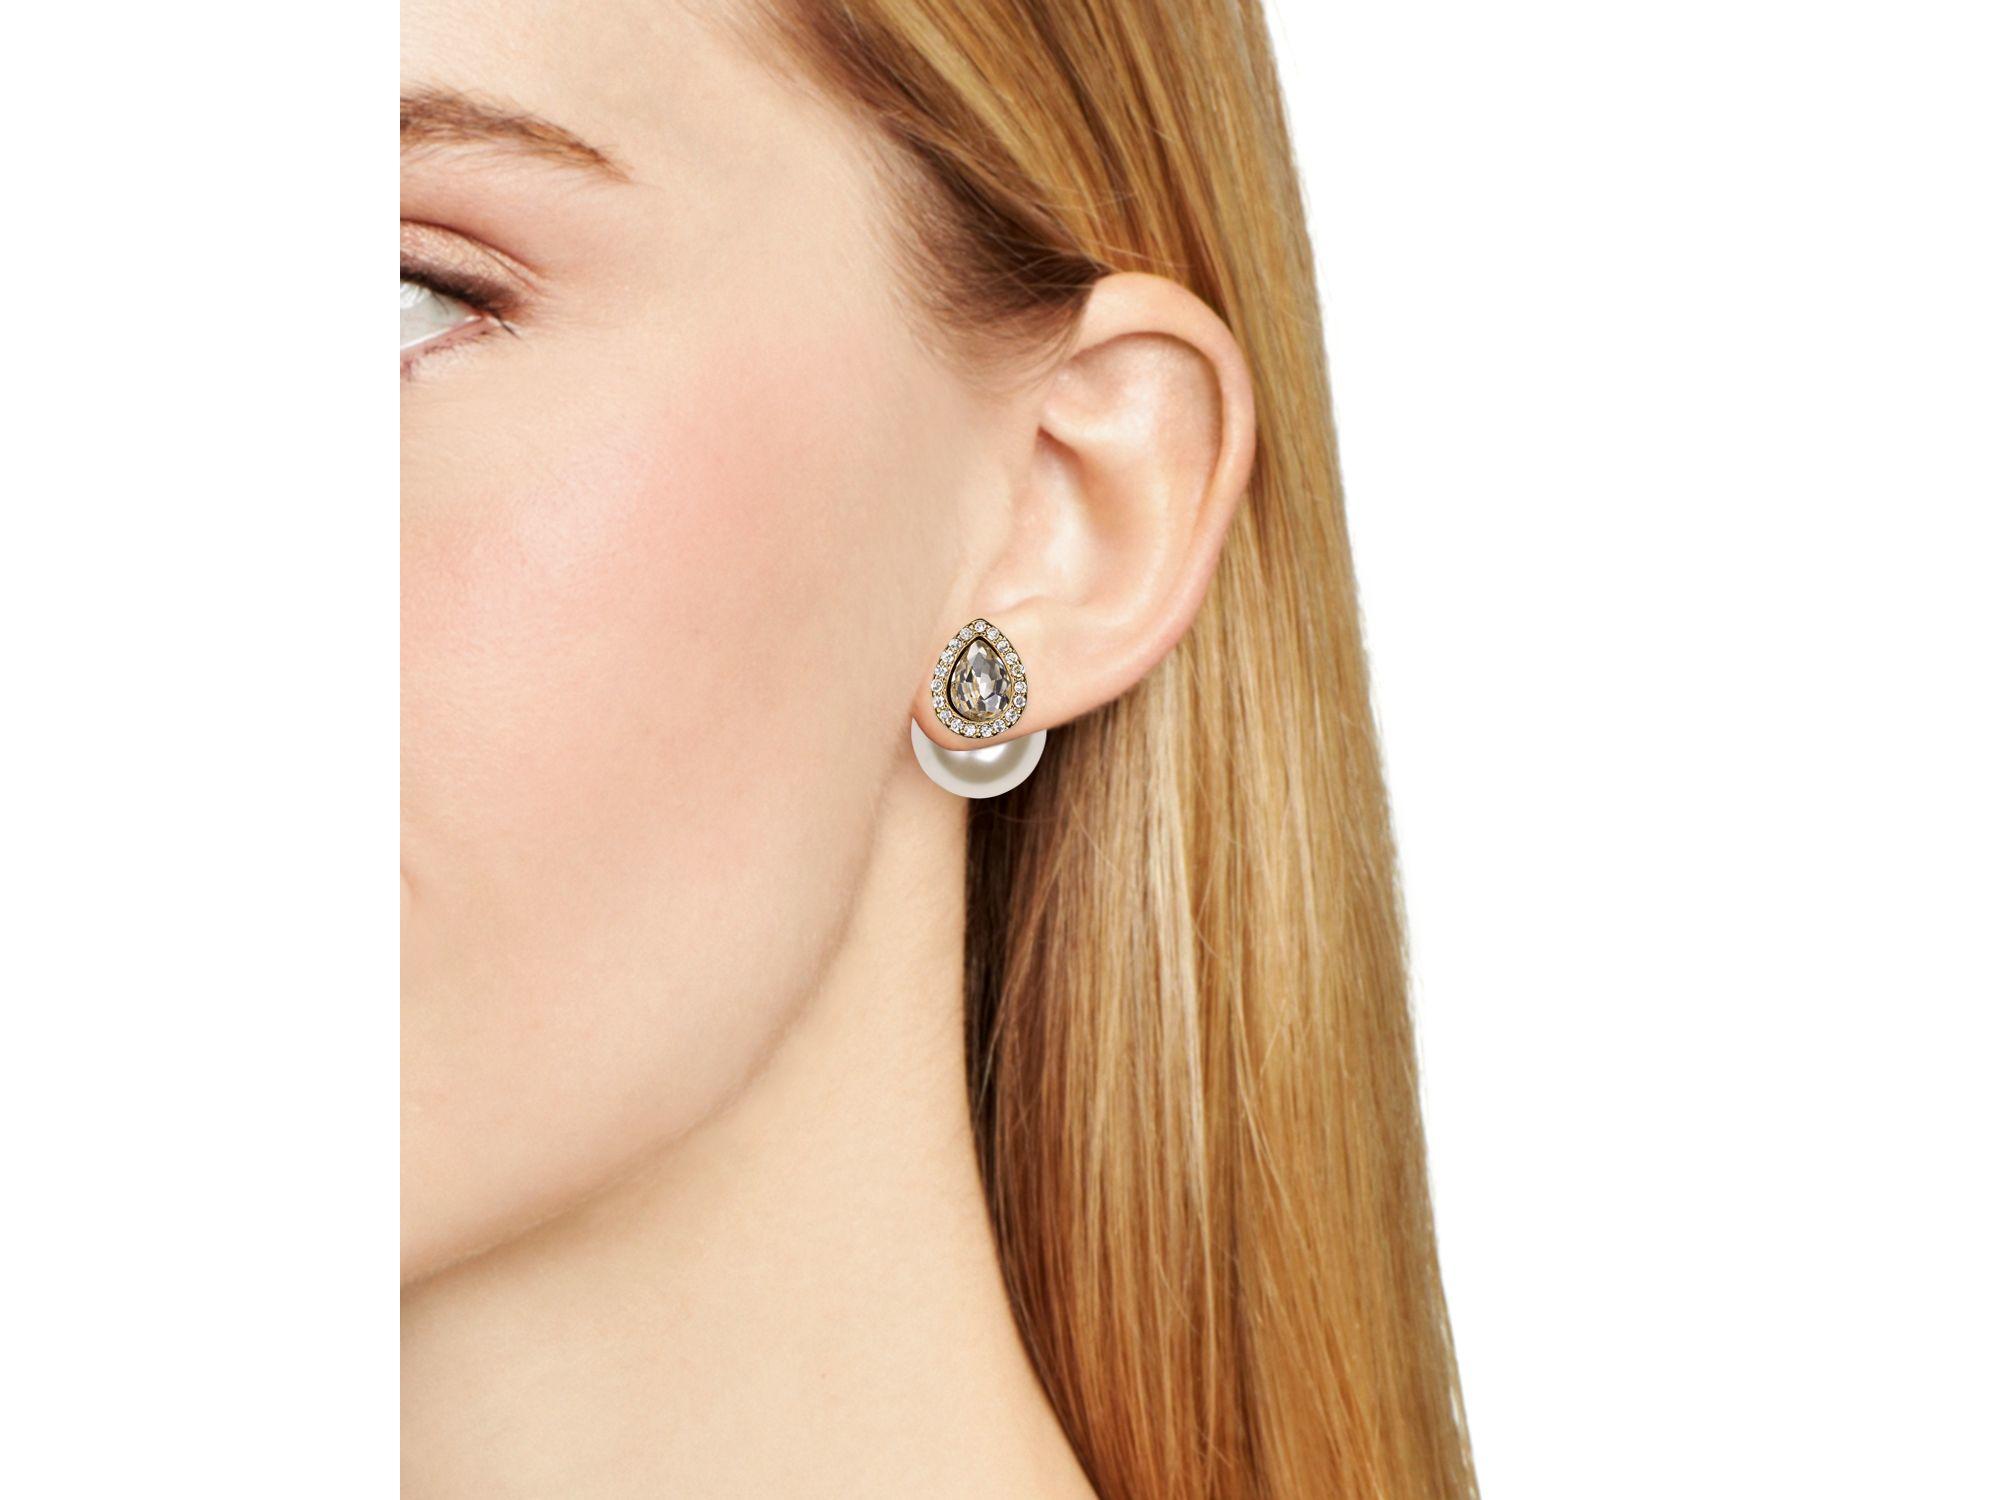 Womens Pearl Stud Earrings Kenneth Jay Lane IAkqVI7G